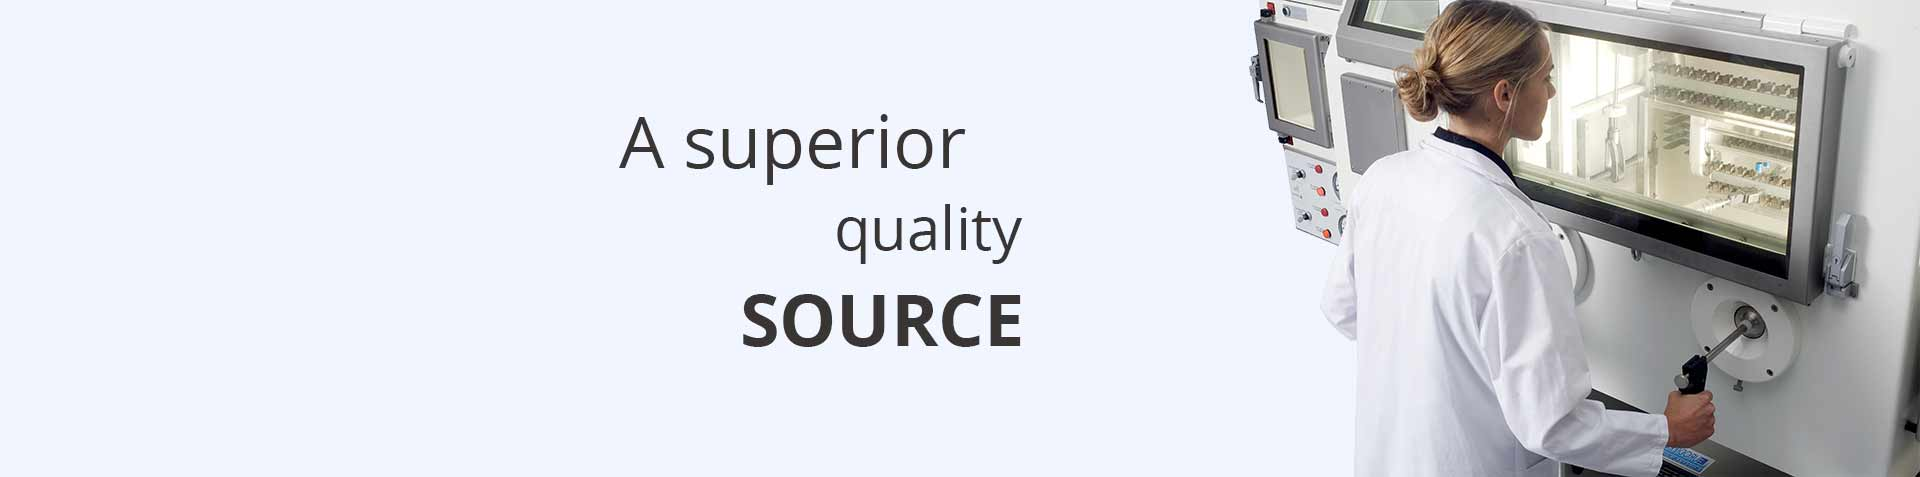 Global Morpho Pharma - A superior quality source